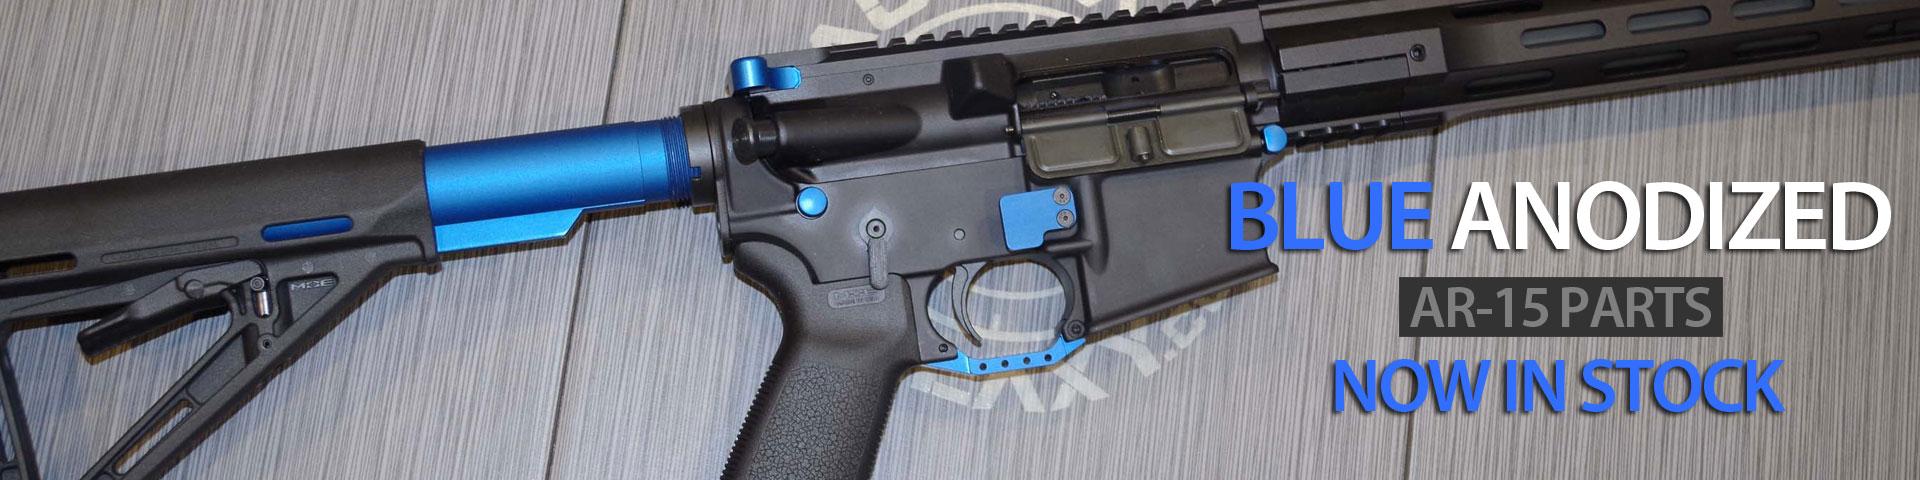 Tactical Gun Parts Ar 15 Glock Ar 10 And 1911 Gun Parts